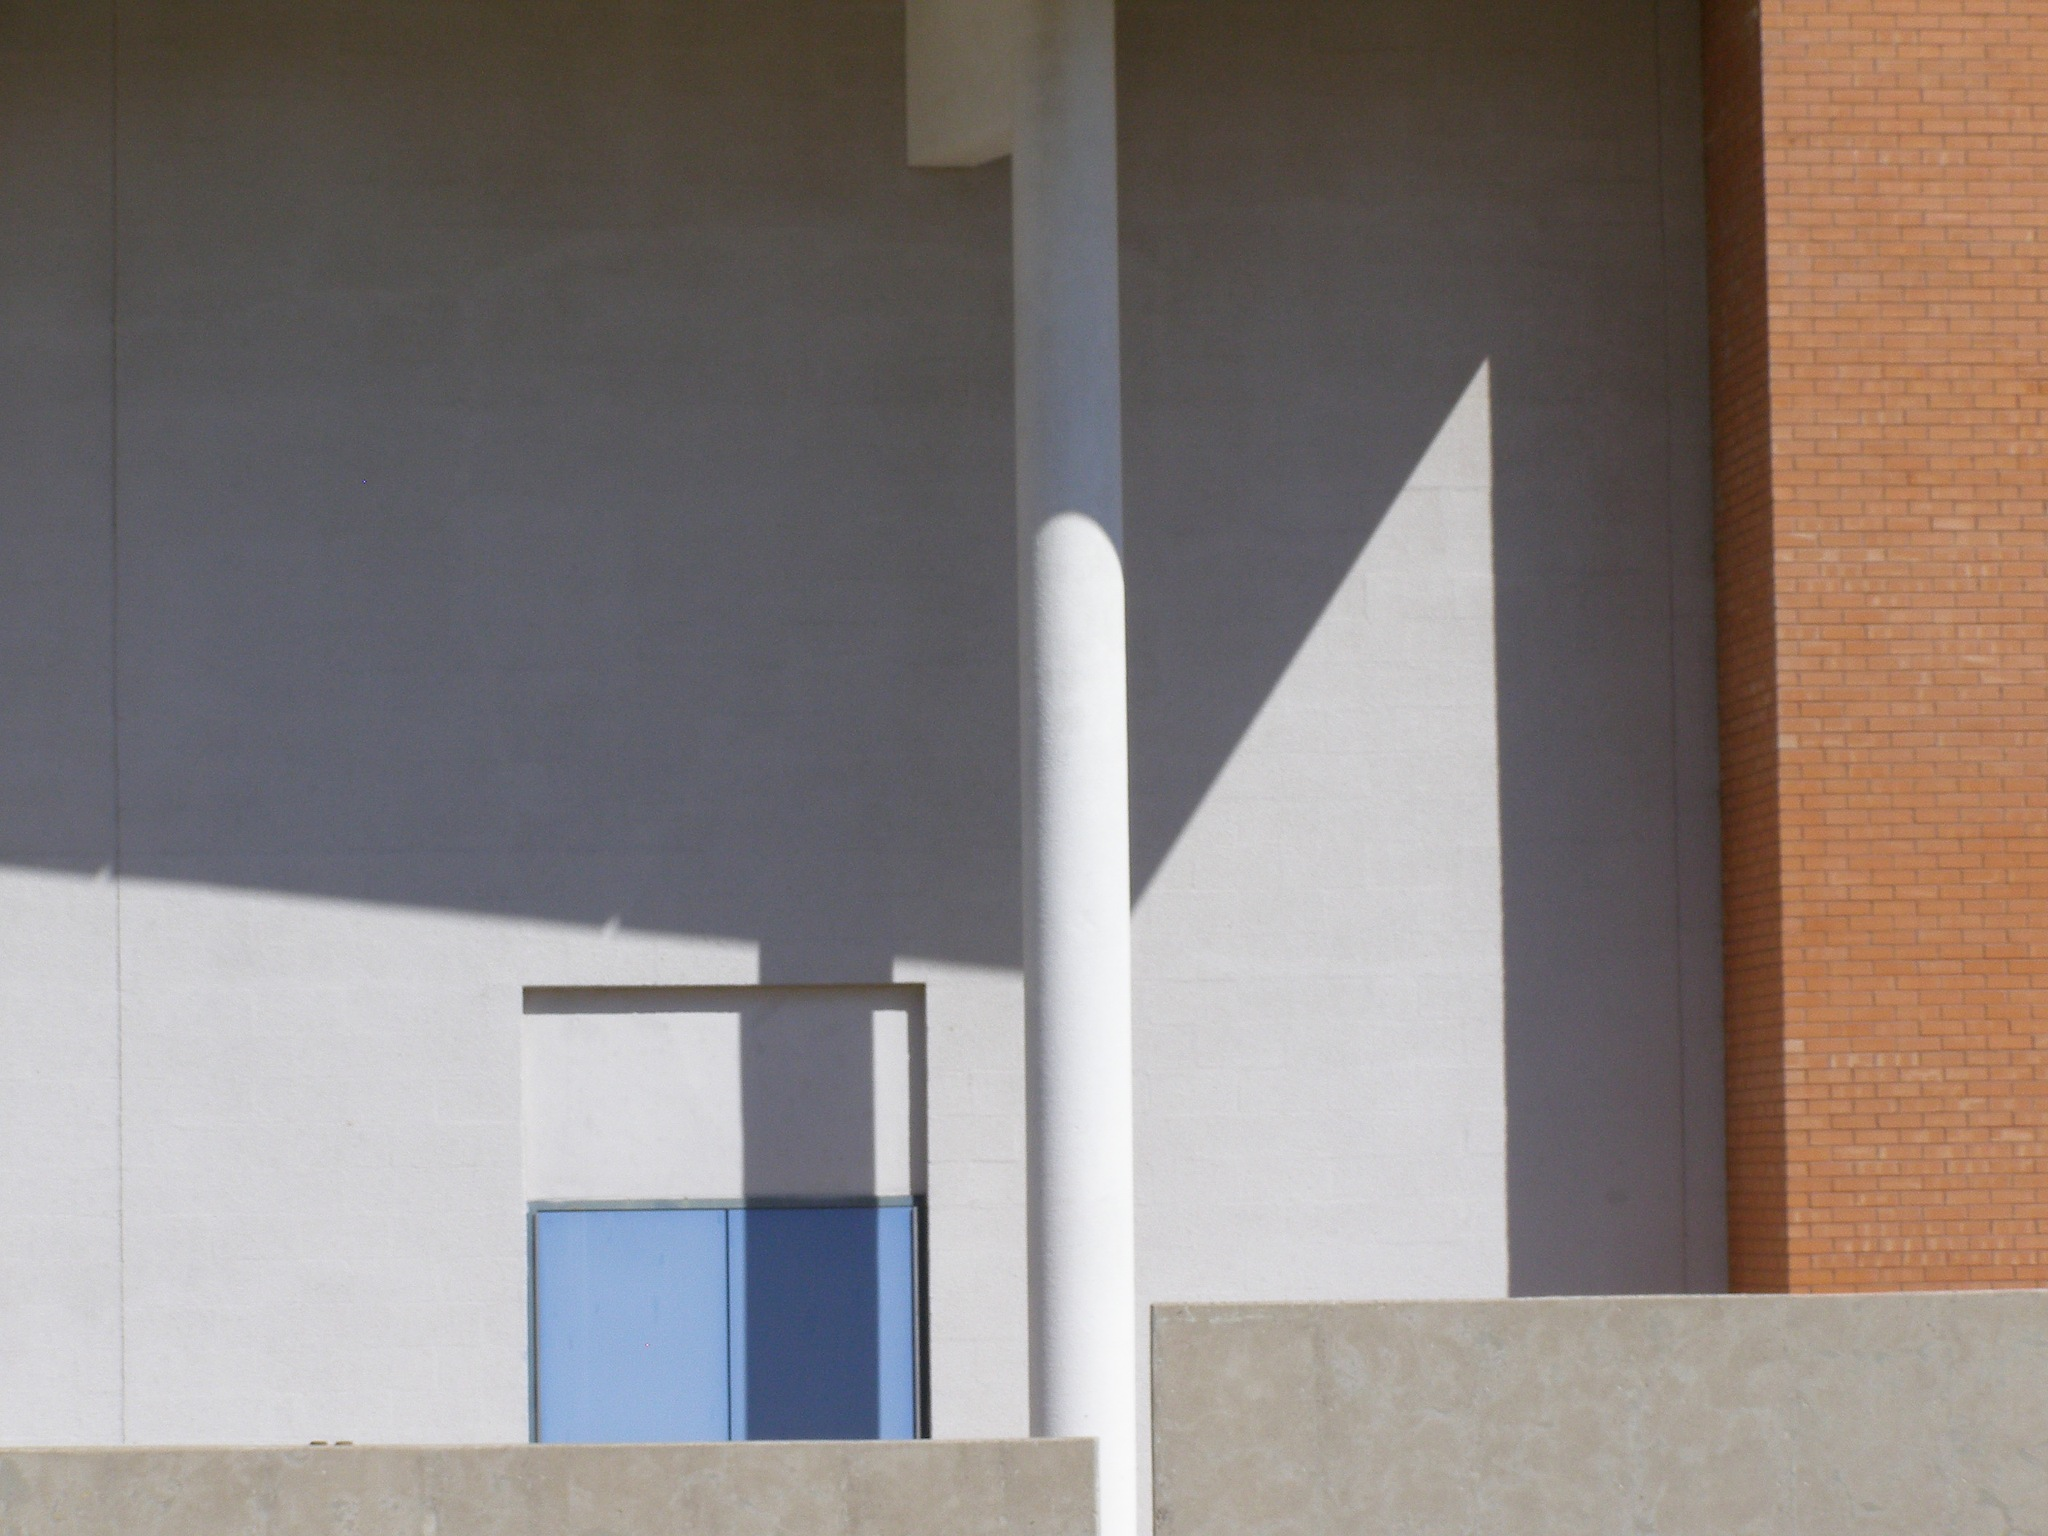 High School Angles by John Banks